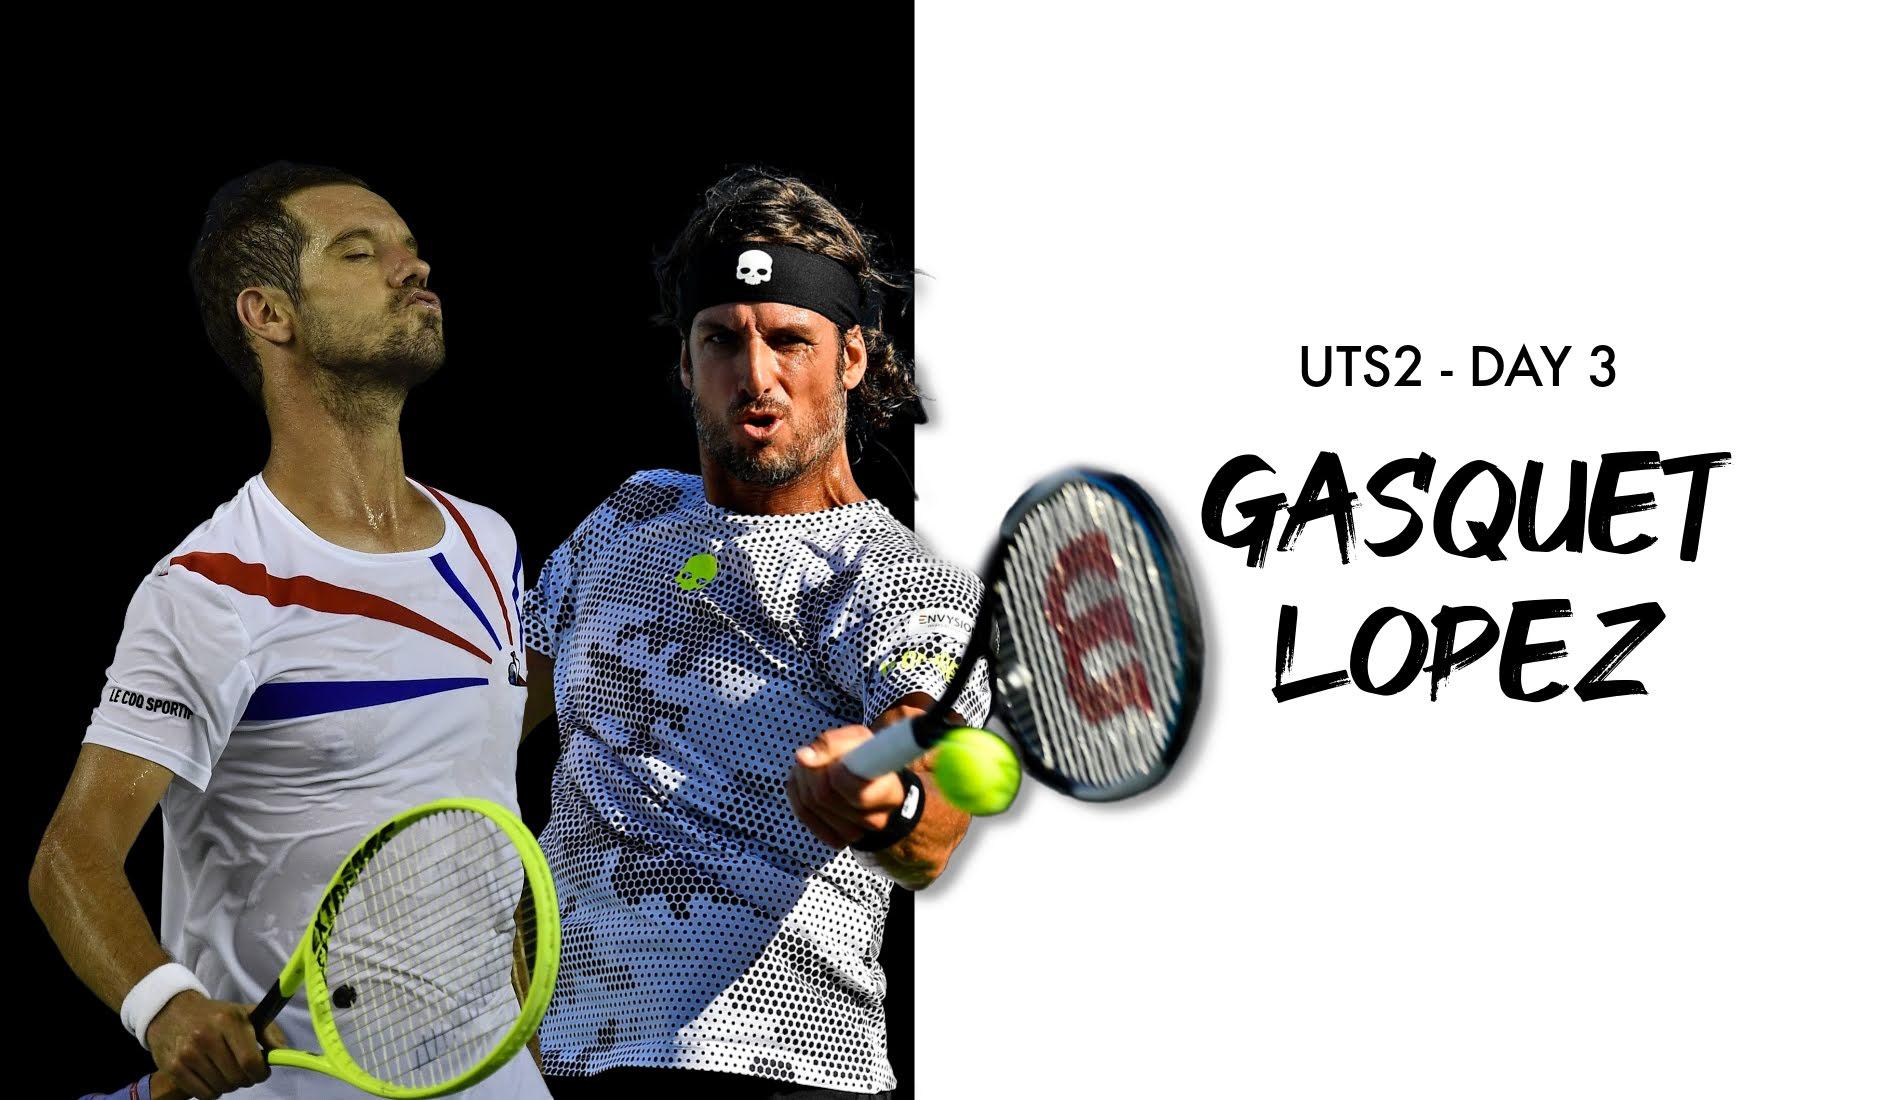 UTS2 - Day 3: Richard Gasquet vs Feliciano Lopez